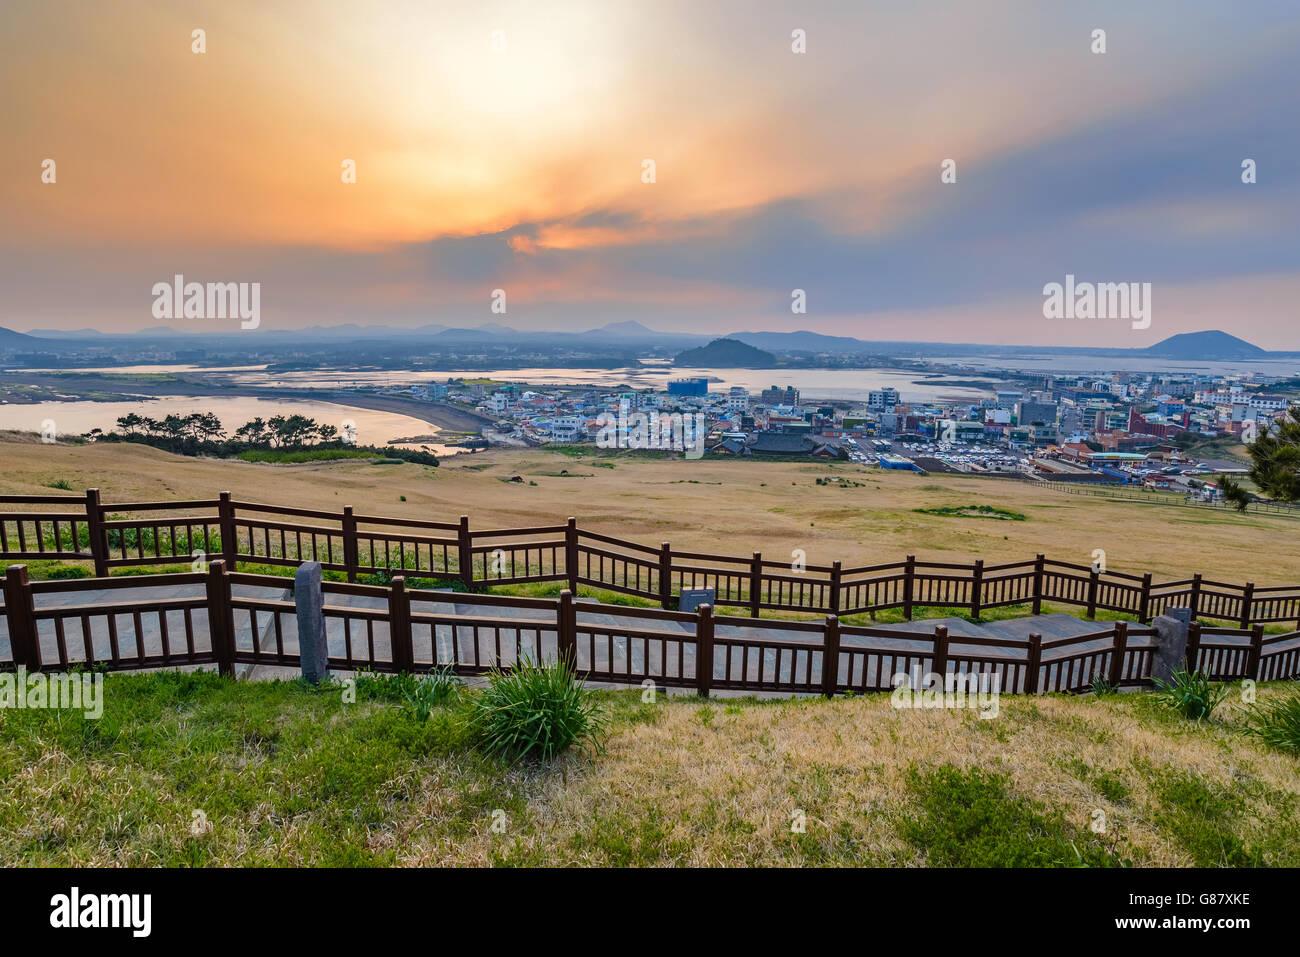 Sunset at Seongsan Ilchulbong, Jeju, South Korea - Stock Image